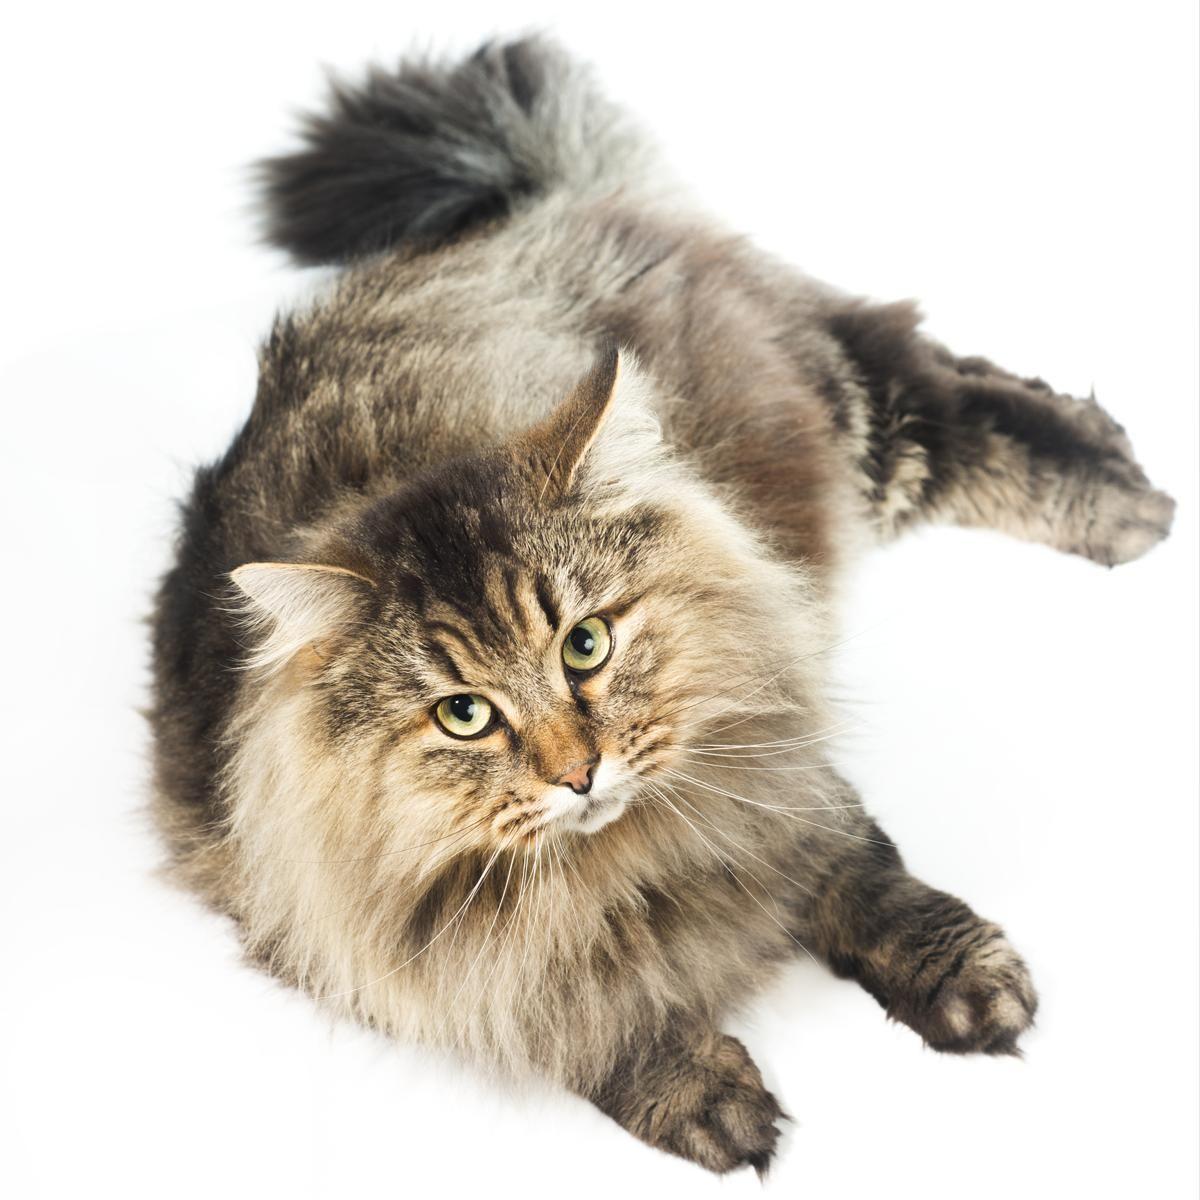 Siberian cat Siberian cat, Tabby cat, Tabby cat pictures